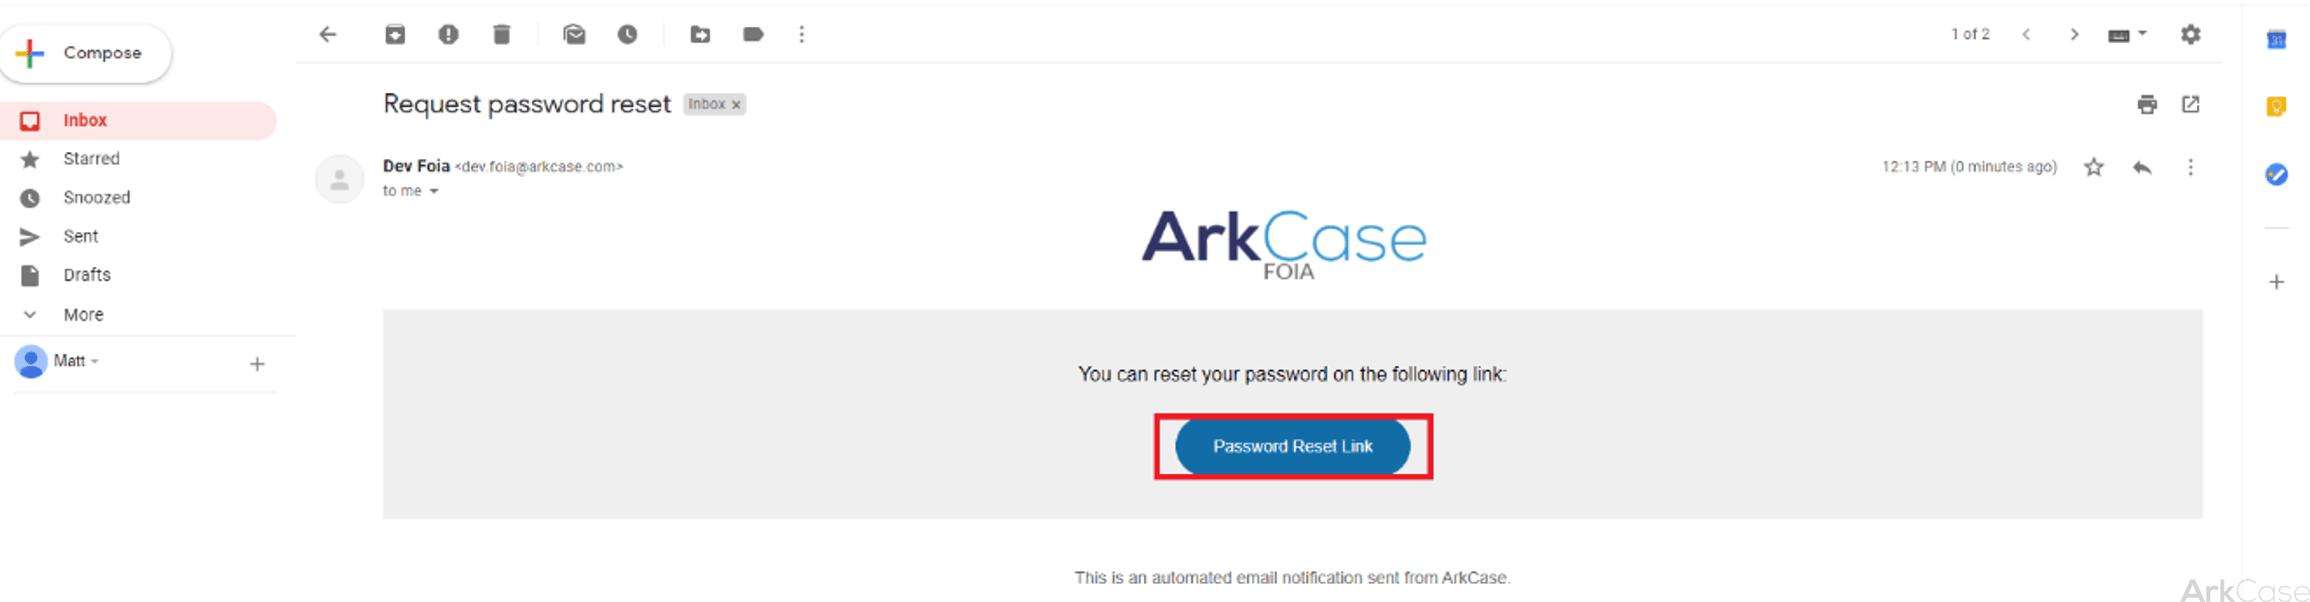 request password reset